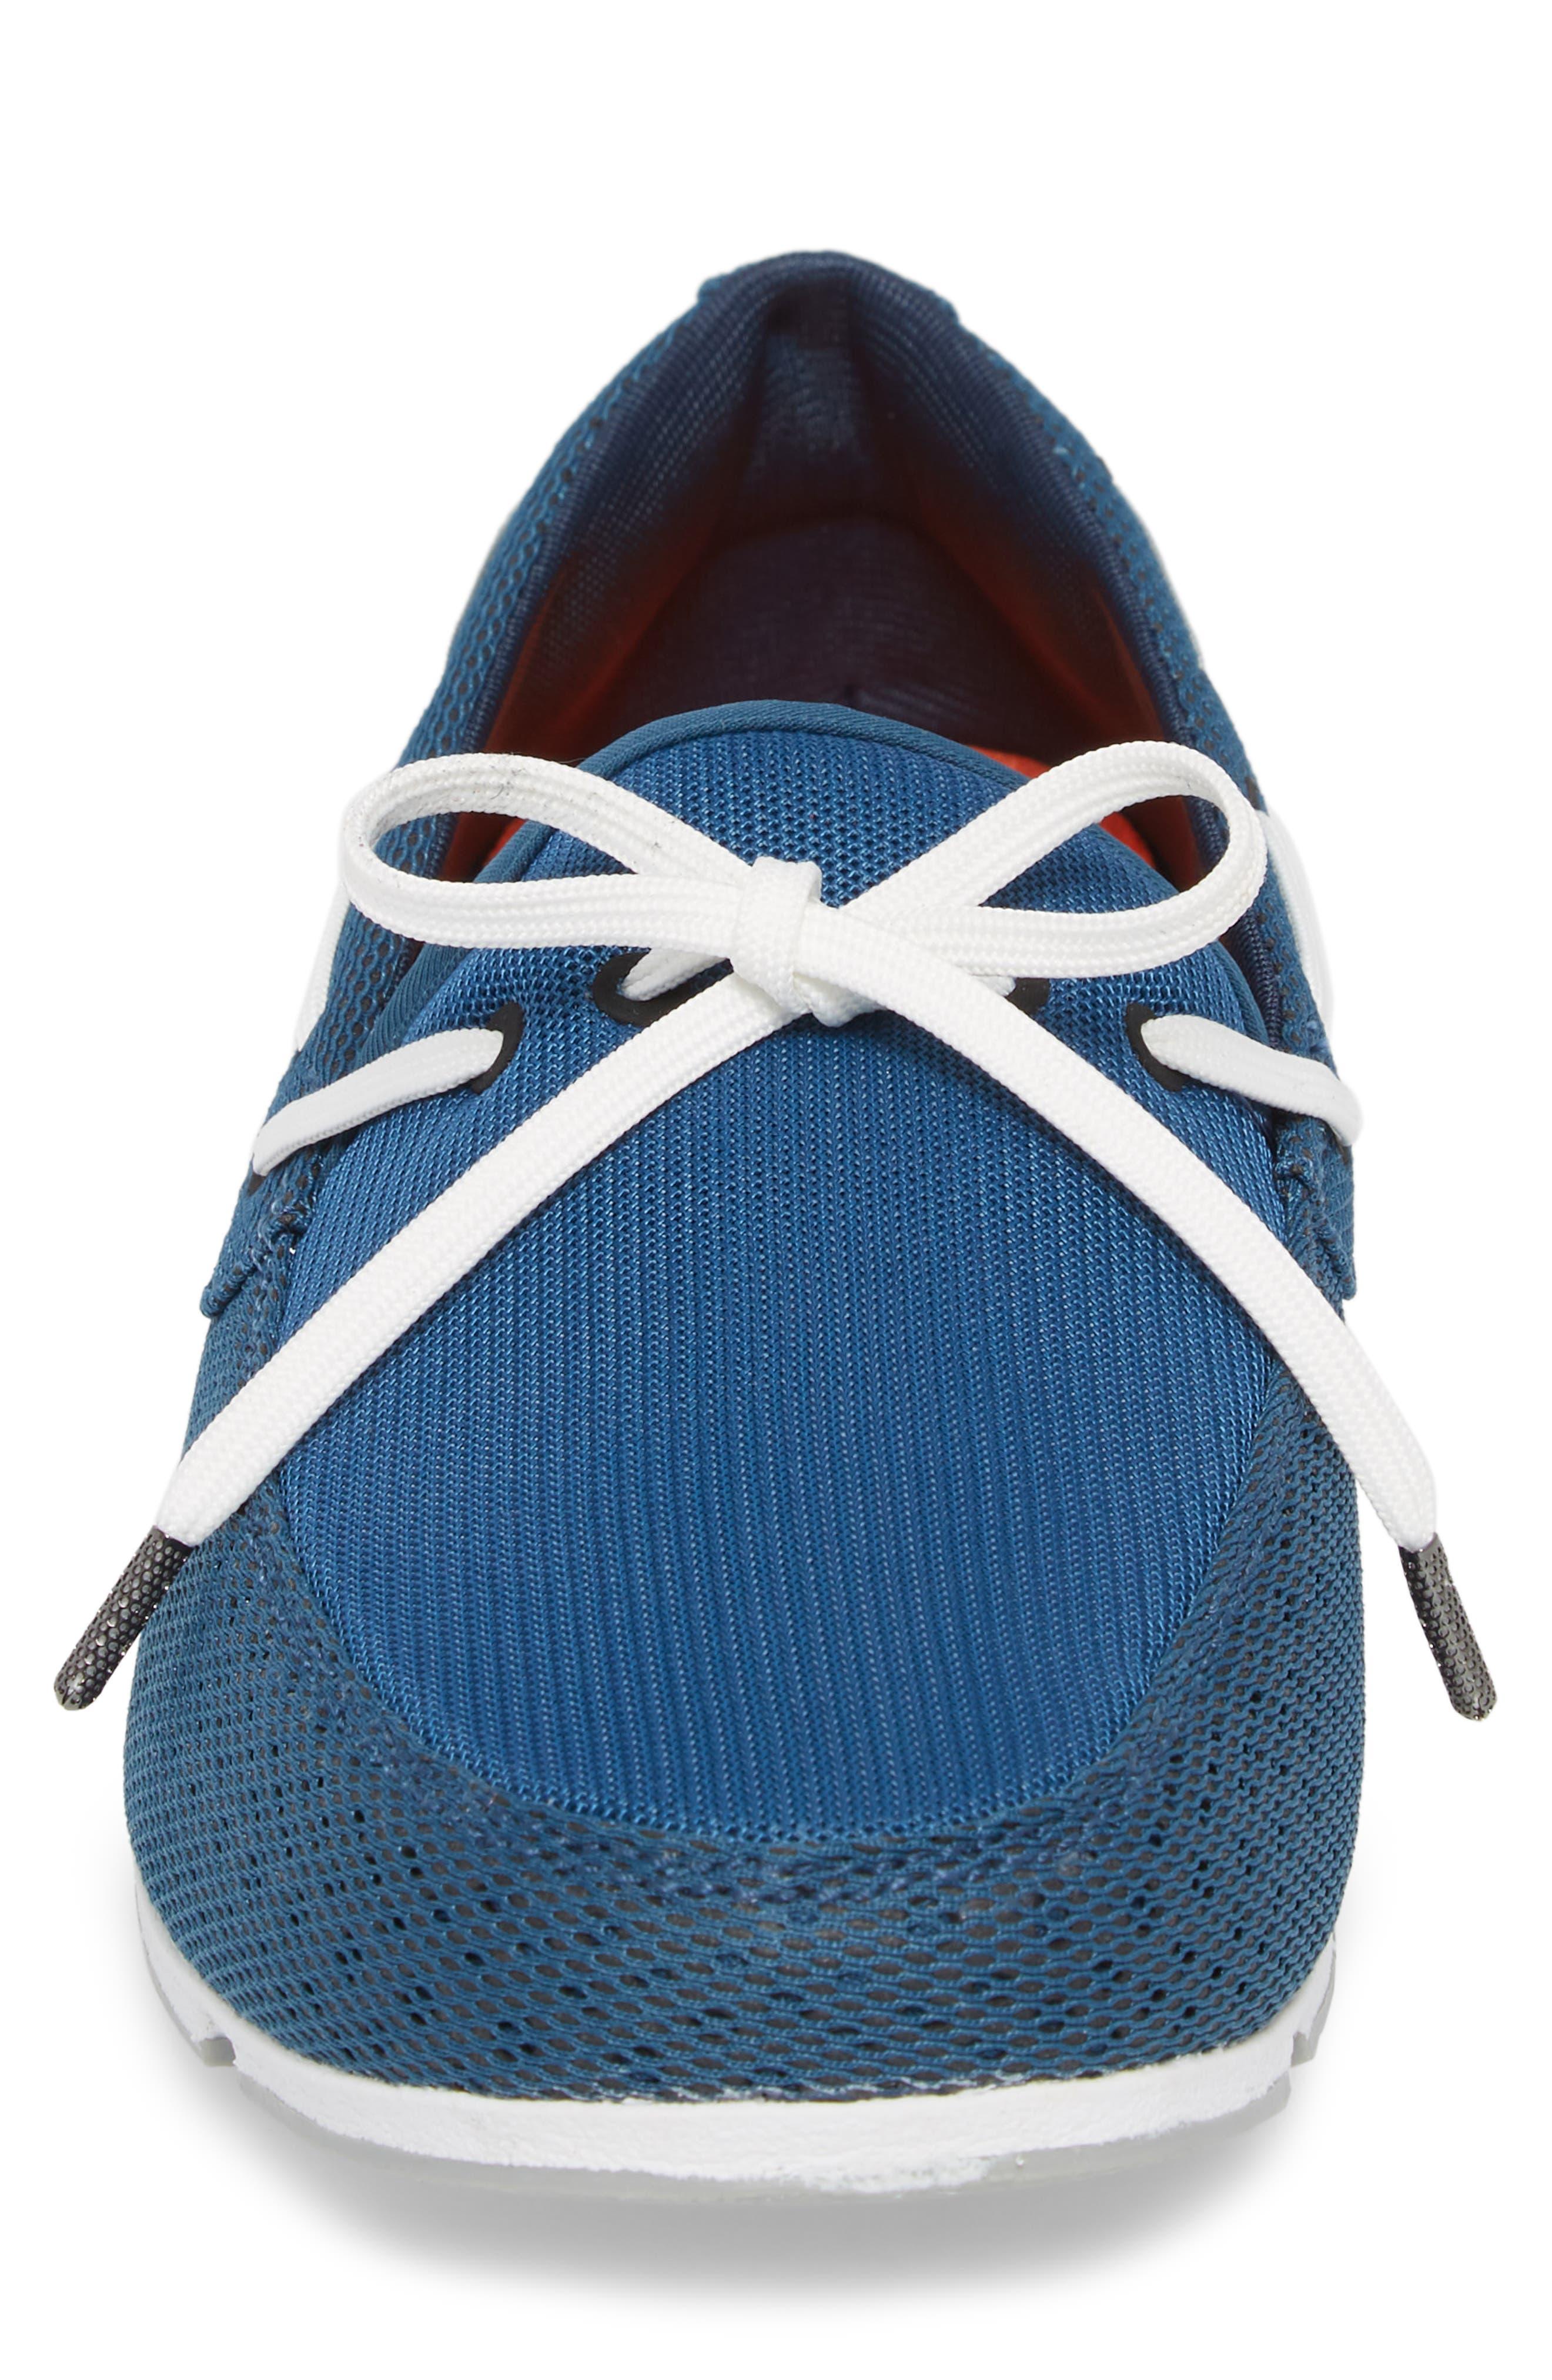 Breeze Loafer,                             Alternate thumbnail 4, color,                             Blue/ White